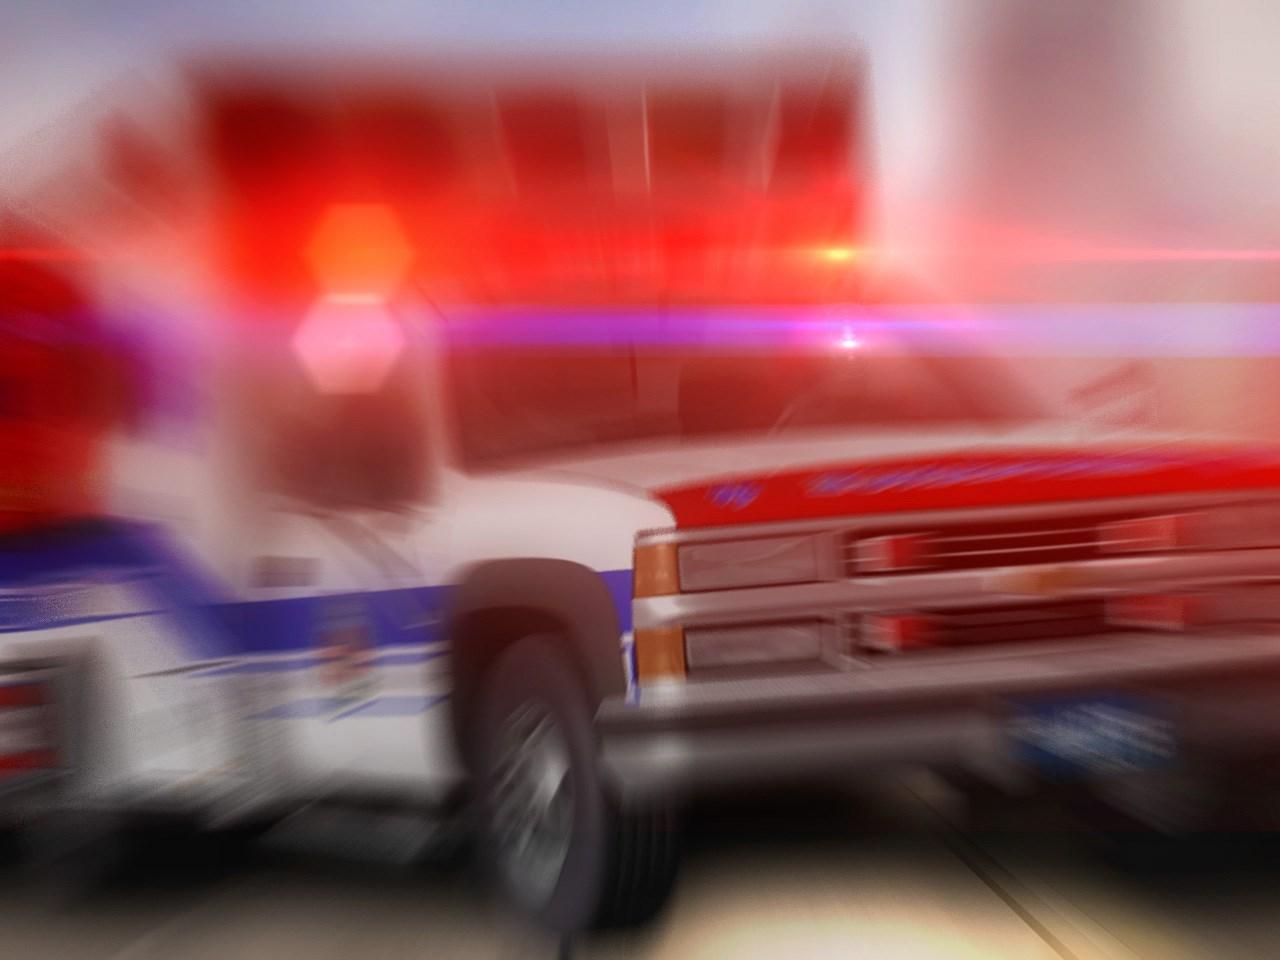 Ambulance 3_1554003733742.jpg.jpg